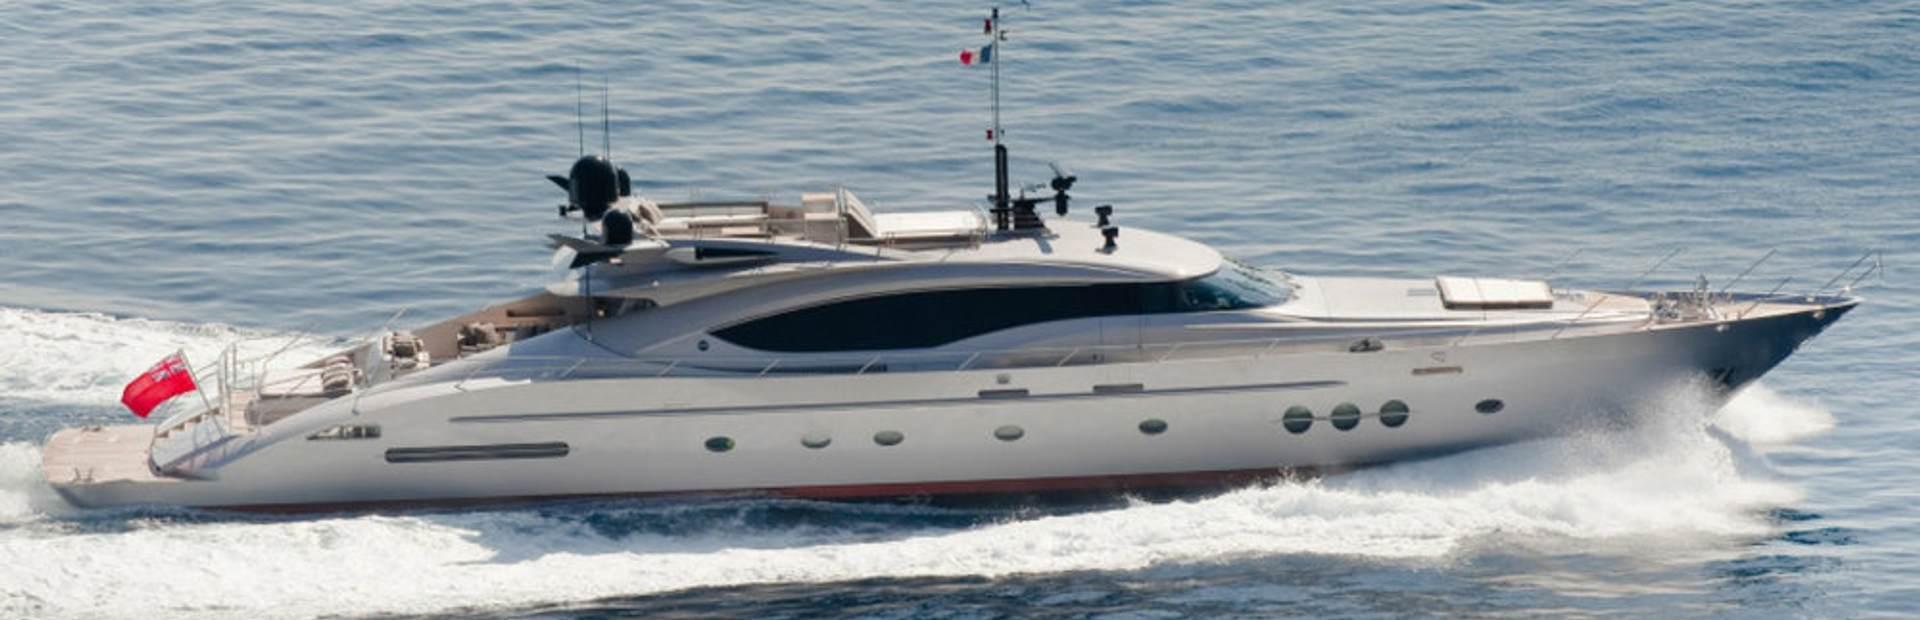 Palmer Johnson 'PJ 120' Yacht Charter